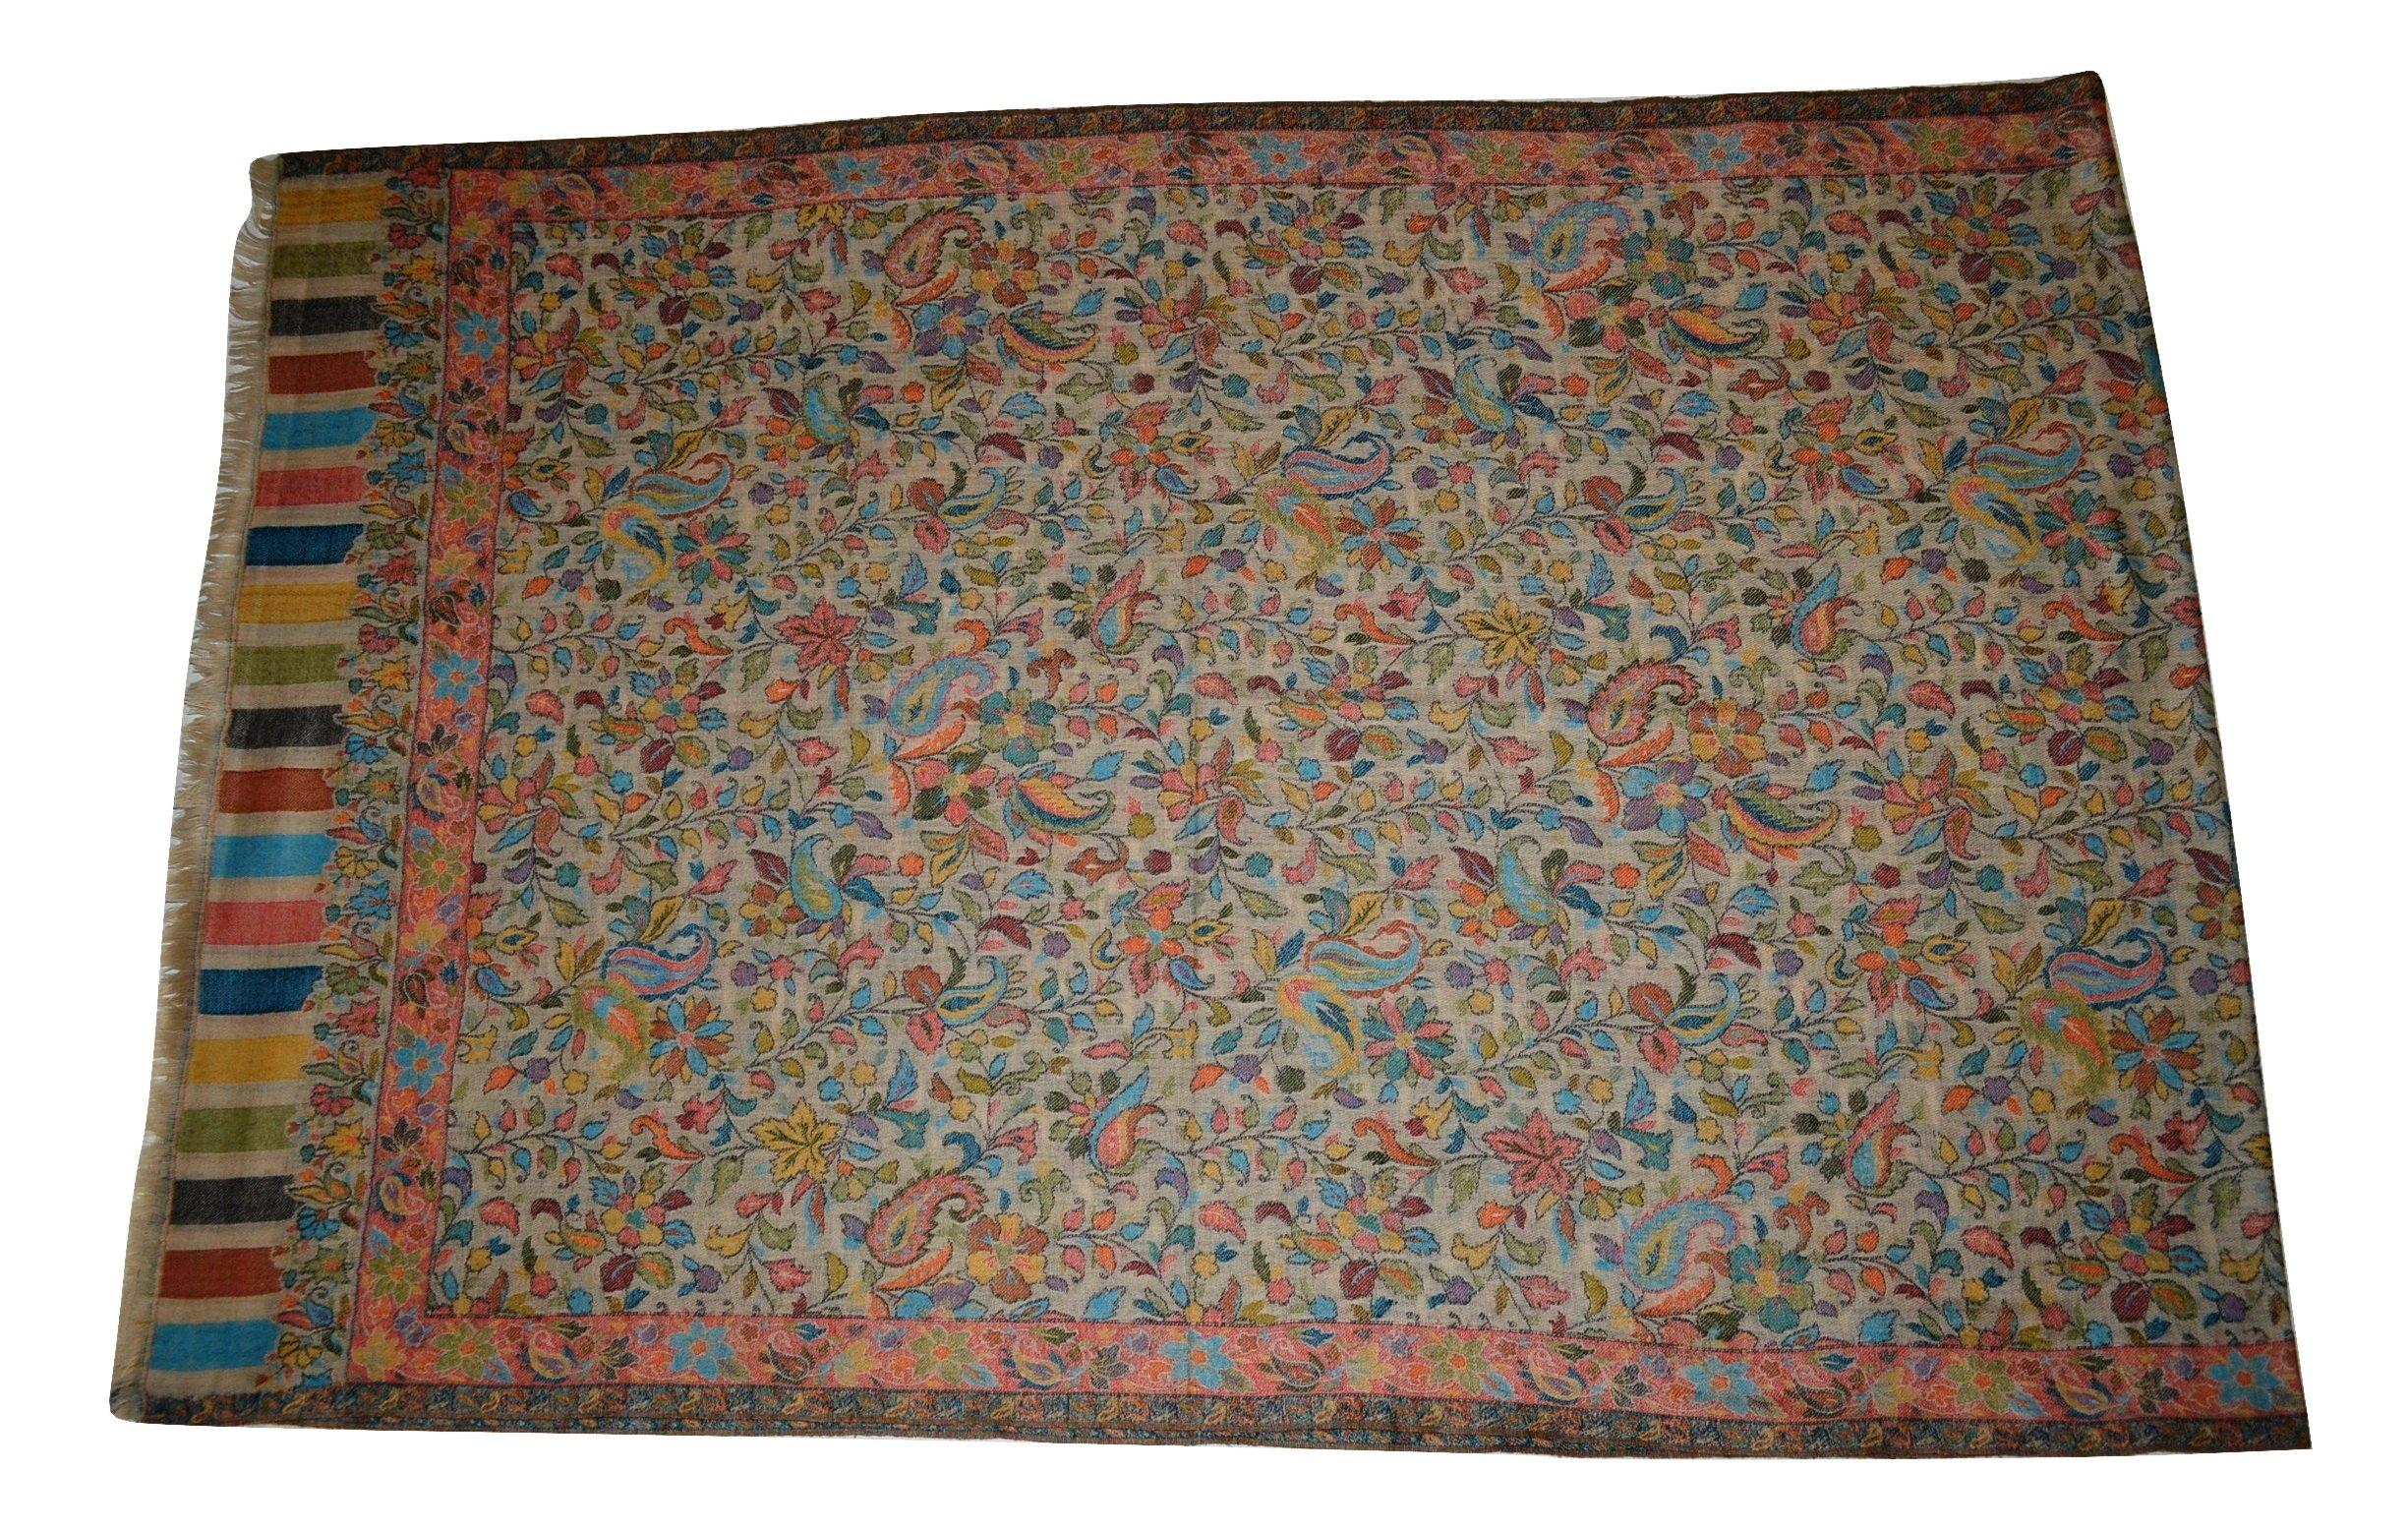 Handmade Pashmina & Fine Wool Fabric Multicolor Floral Paisley KANI Scarf/Stole.X1832